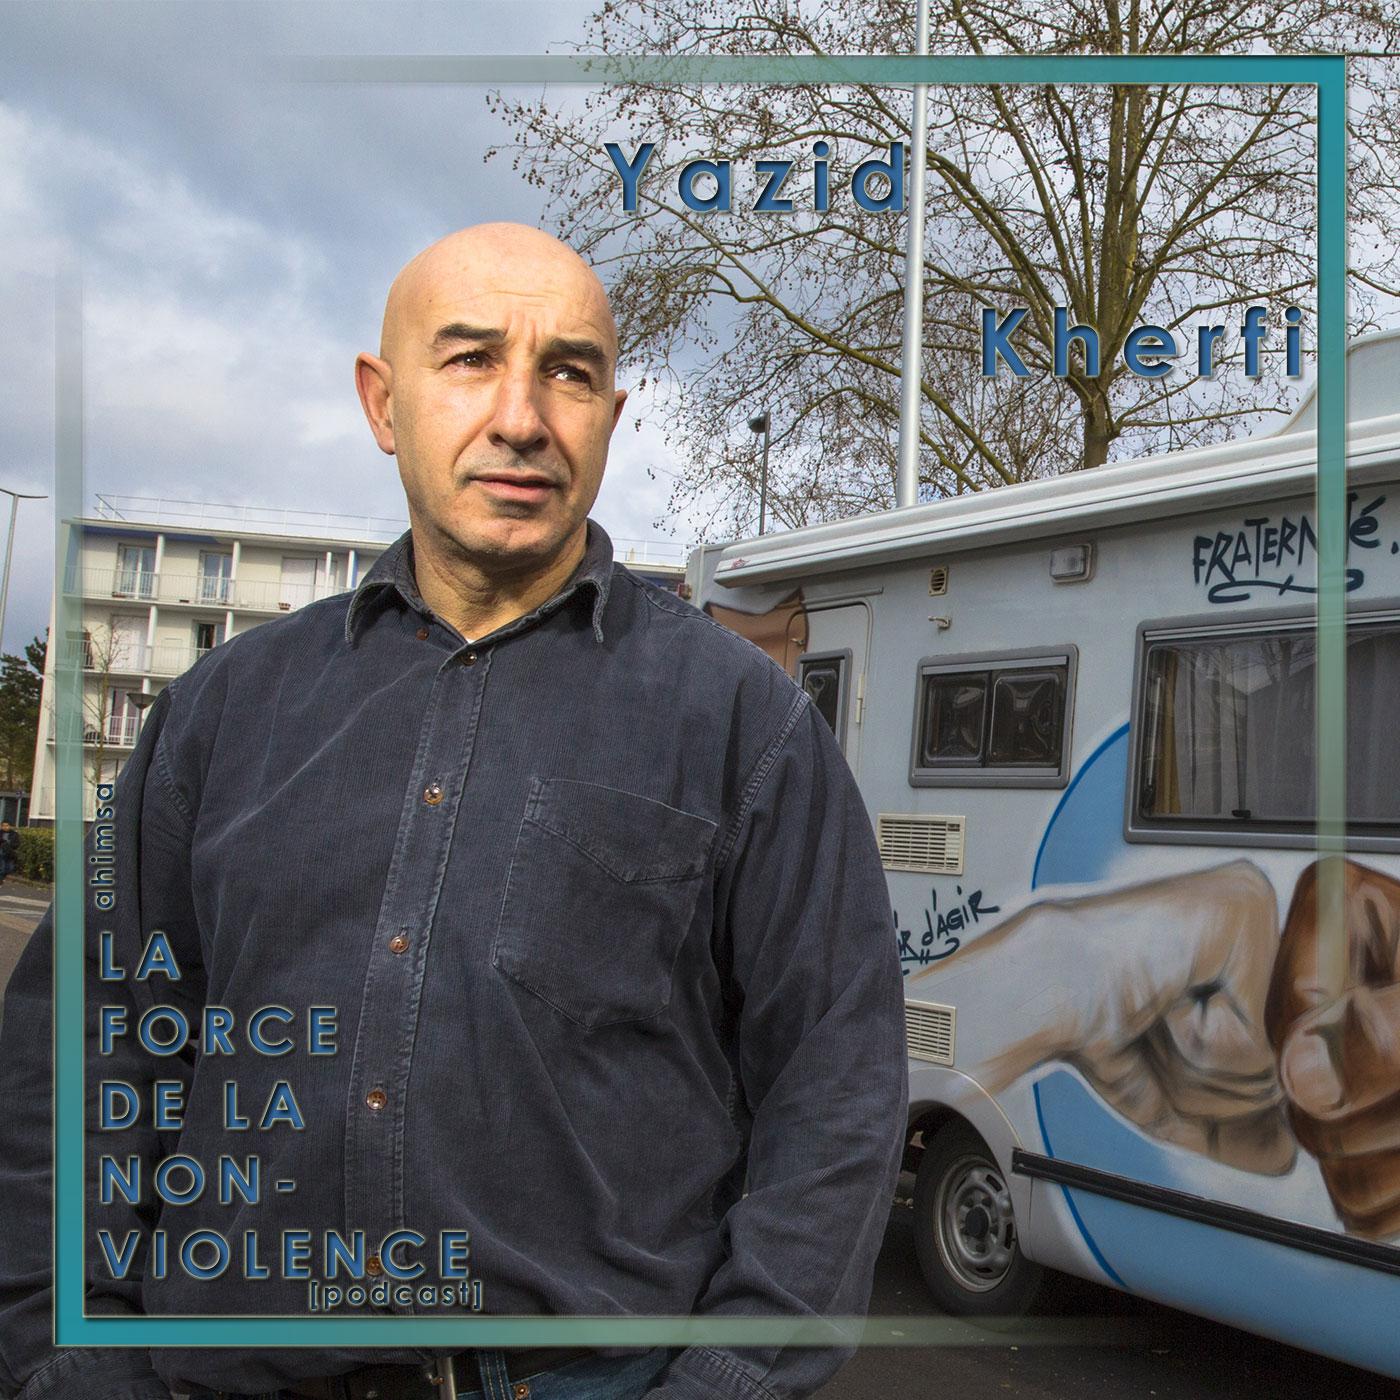 Yazid Kherfi - podcast - La Force de la Non-violence